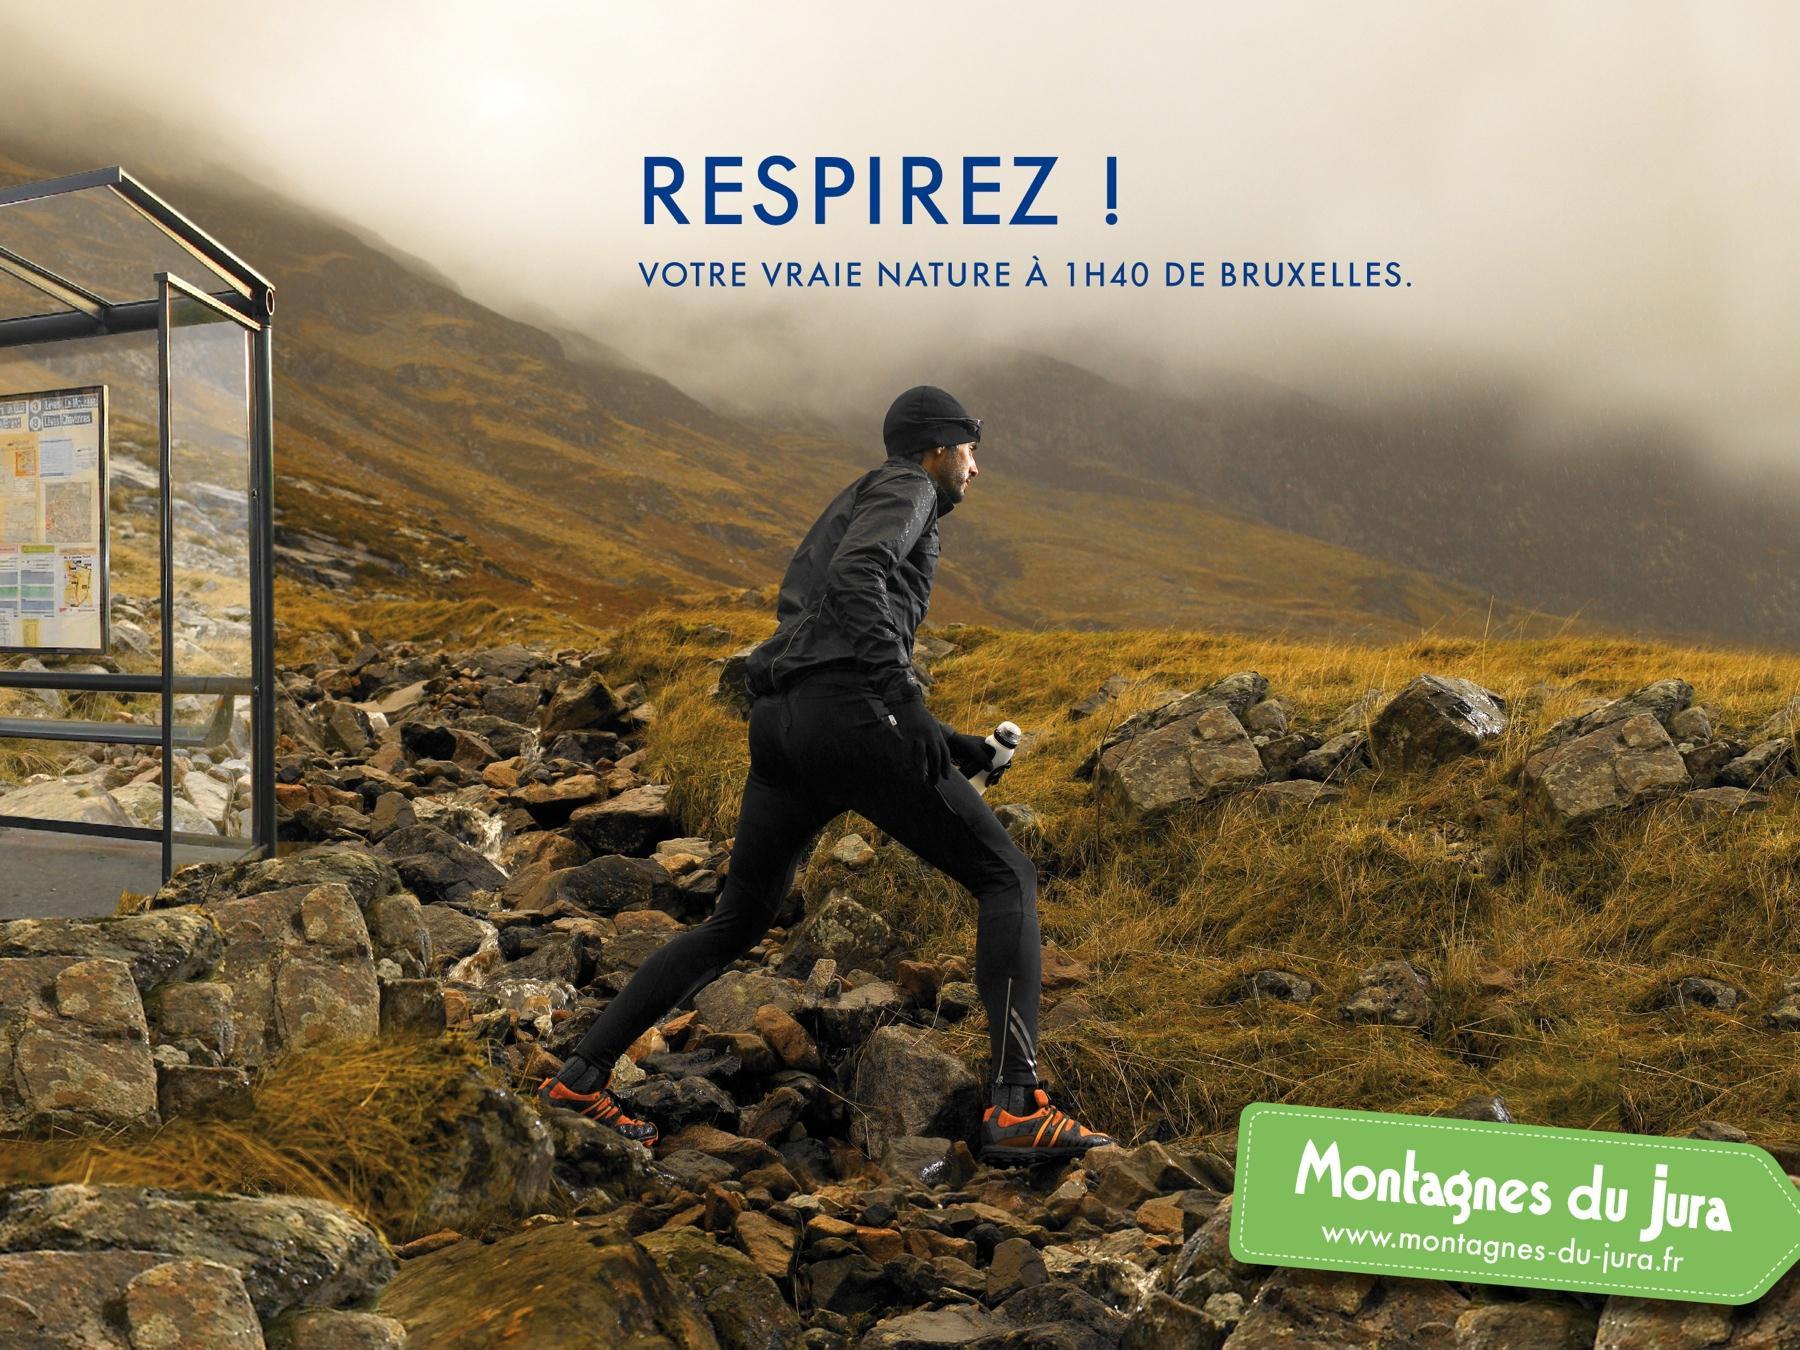 JURA mountain Print Ad -  Bruxelles